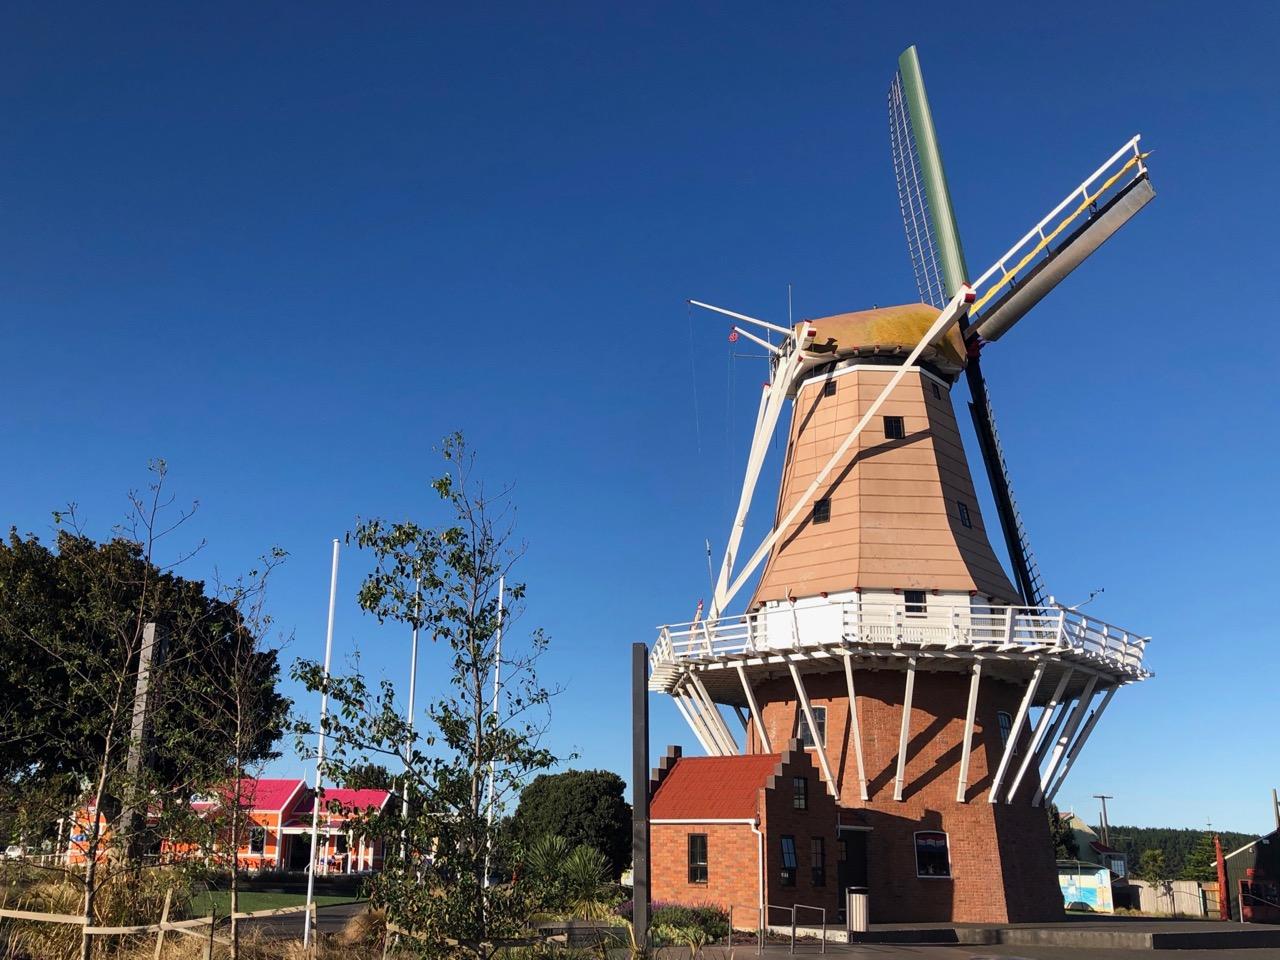 de molen windmill fox ton